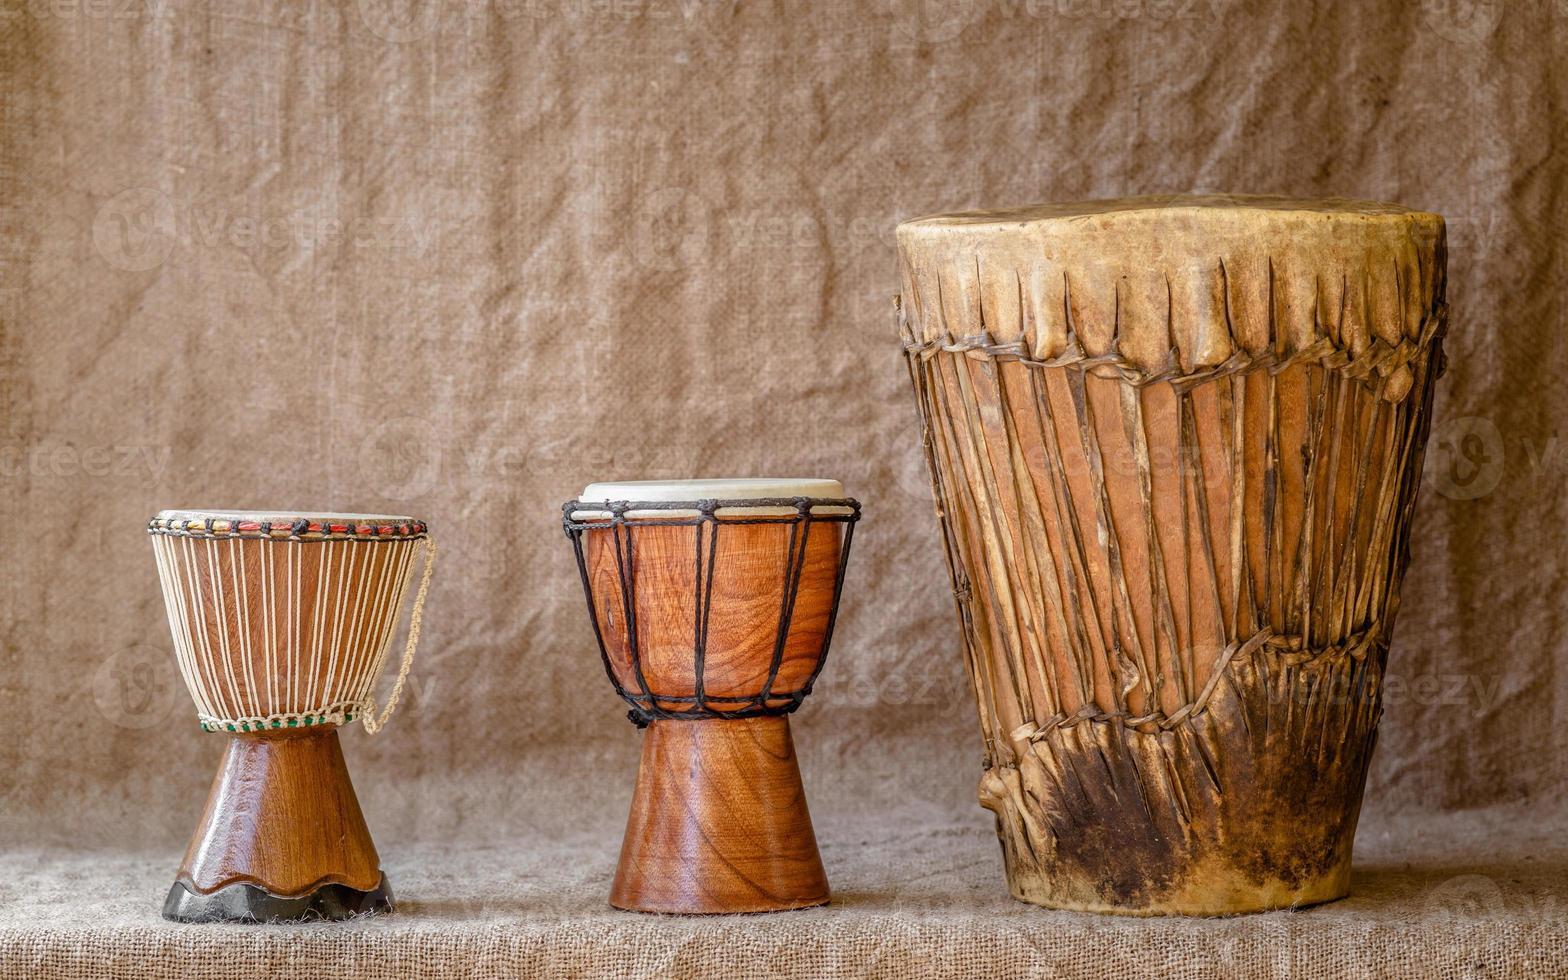 slaginstrumenten foto